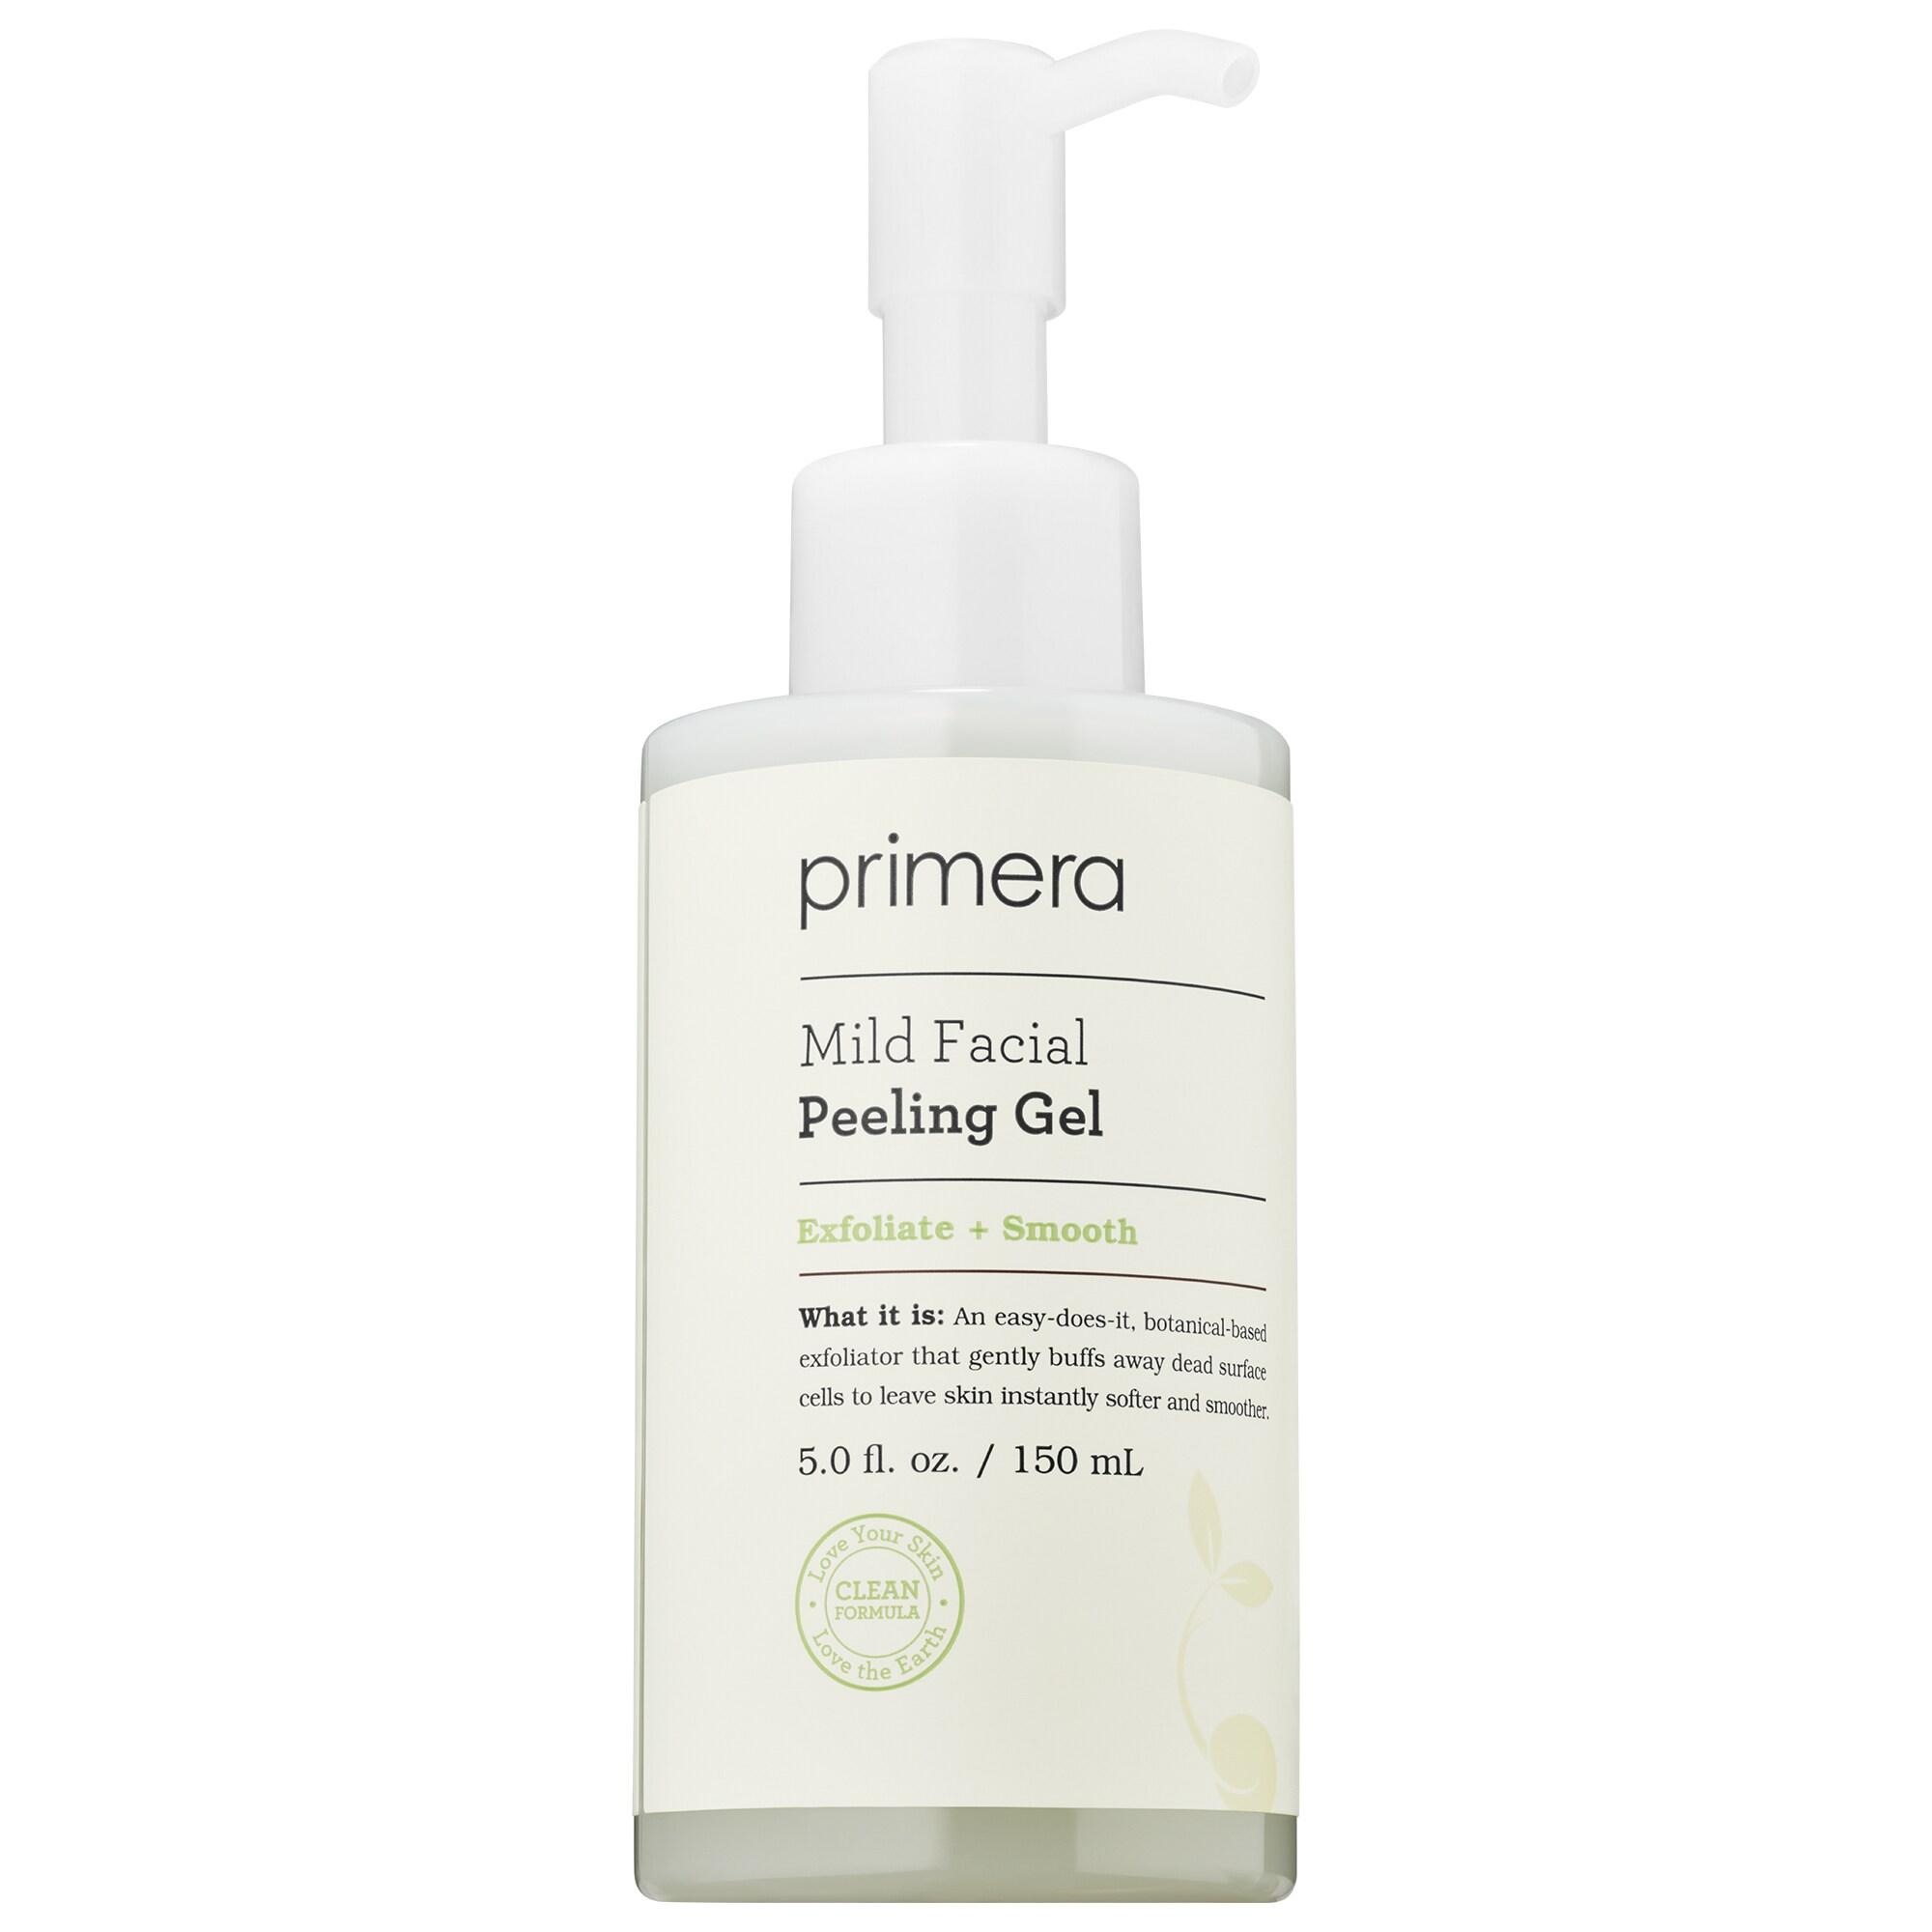 Primera - Mild Facial Peeling Gel